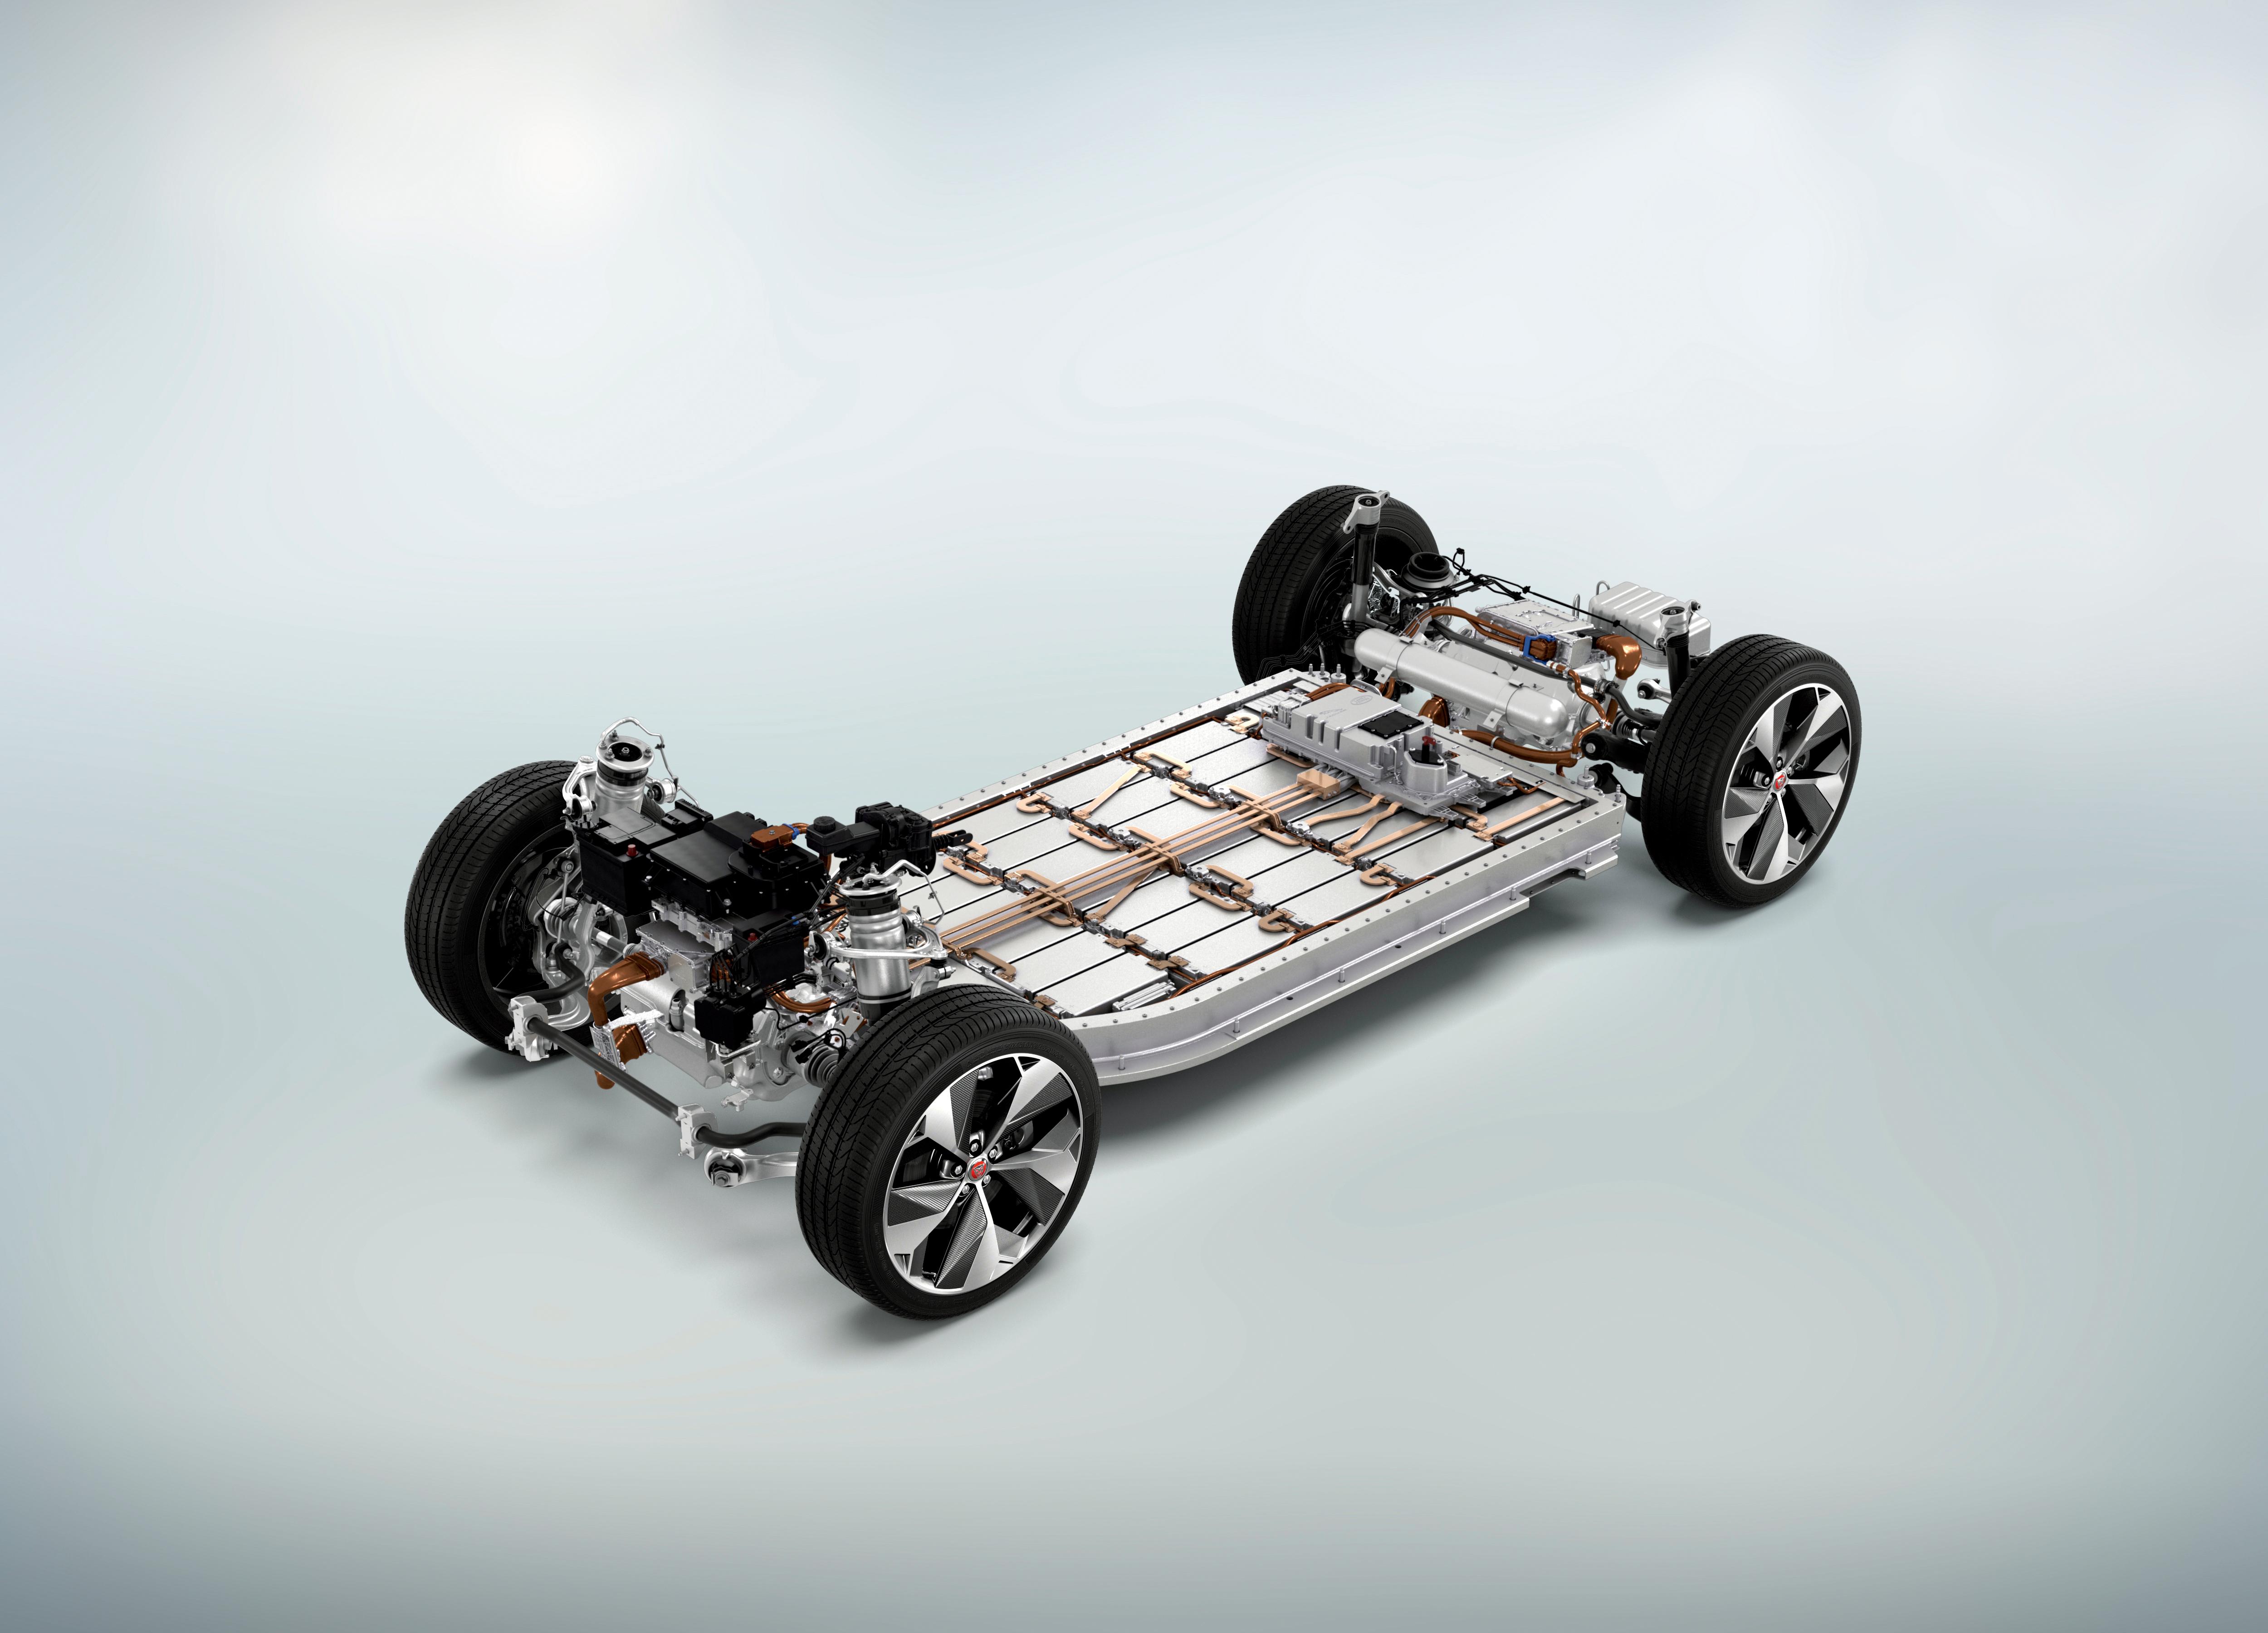 Jaguar Land Rover talks 'structural' parts, fasteners, batteries in